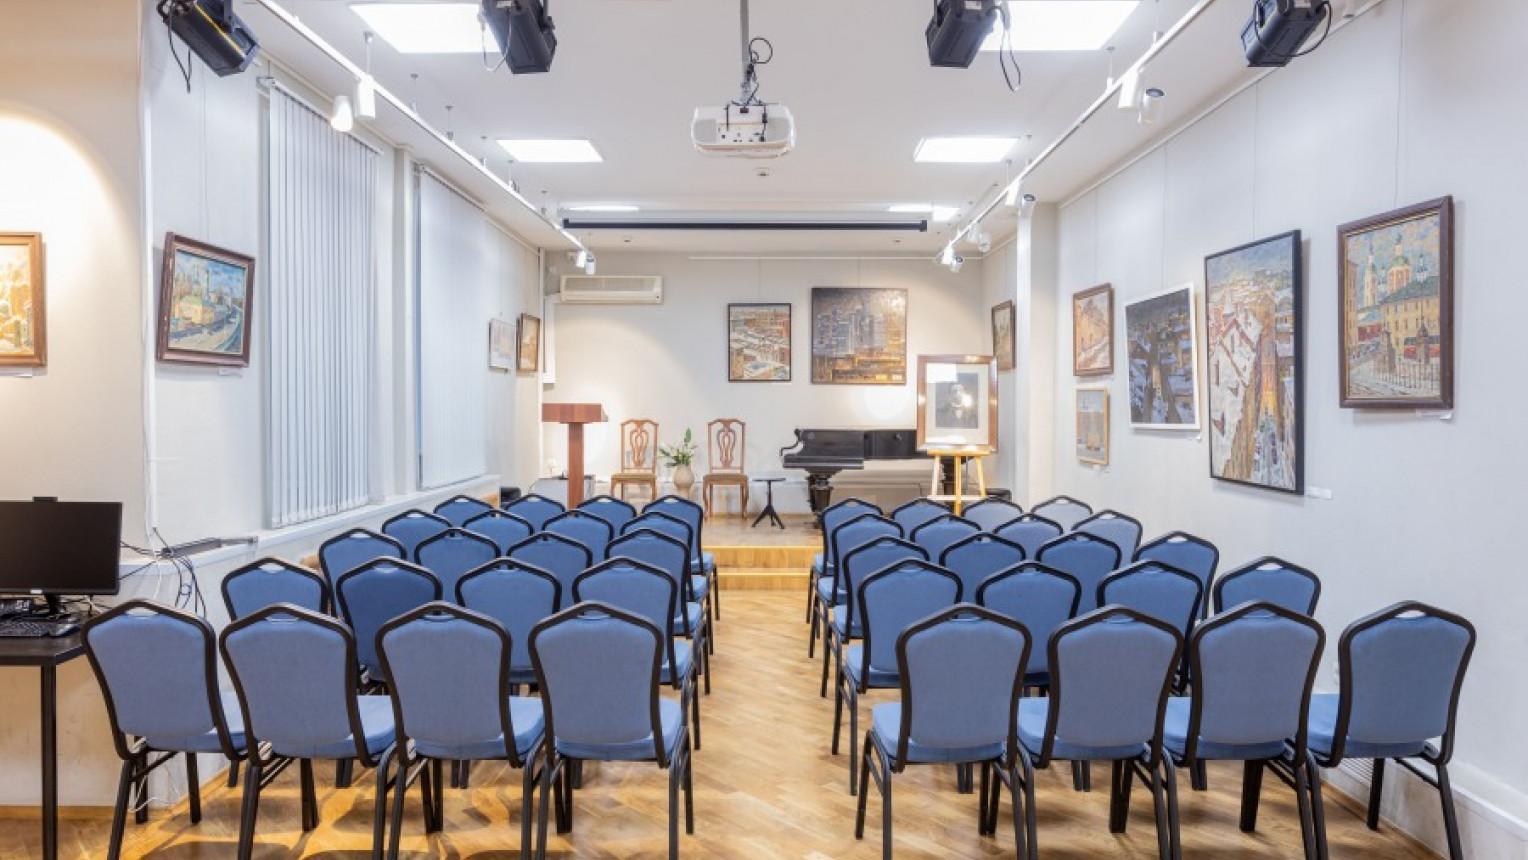 Зал для семинаров, презентаций, тренингов